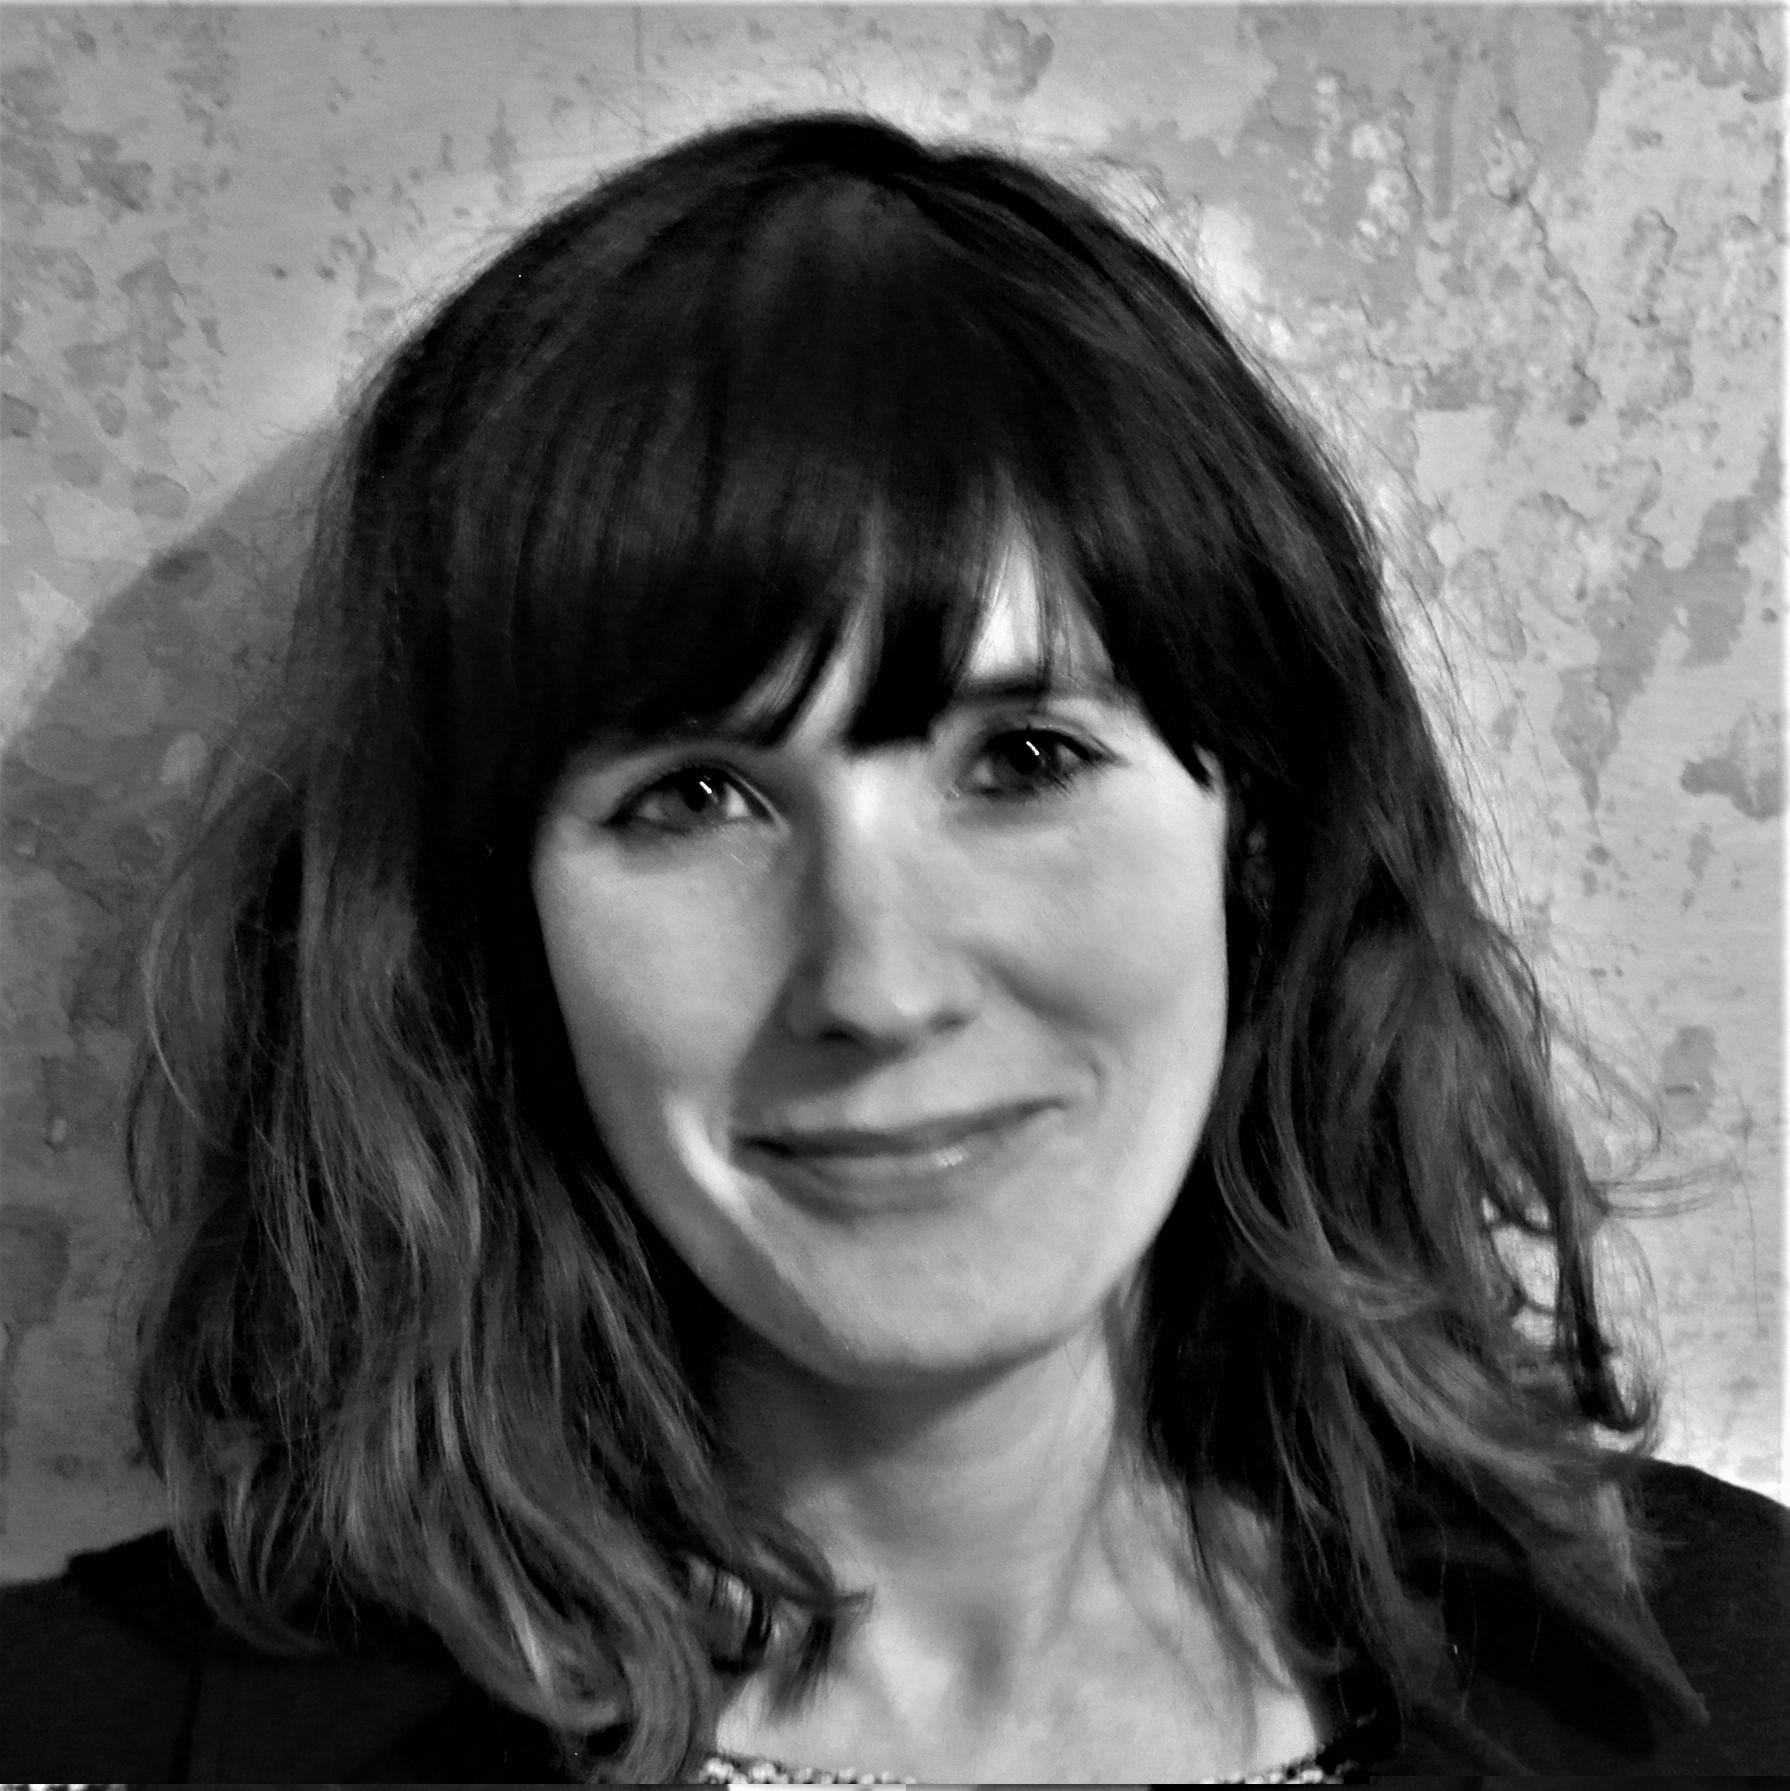 Interview: Children's librarian and debut novelist Sophie Green